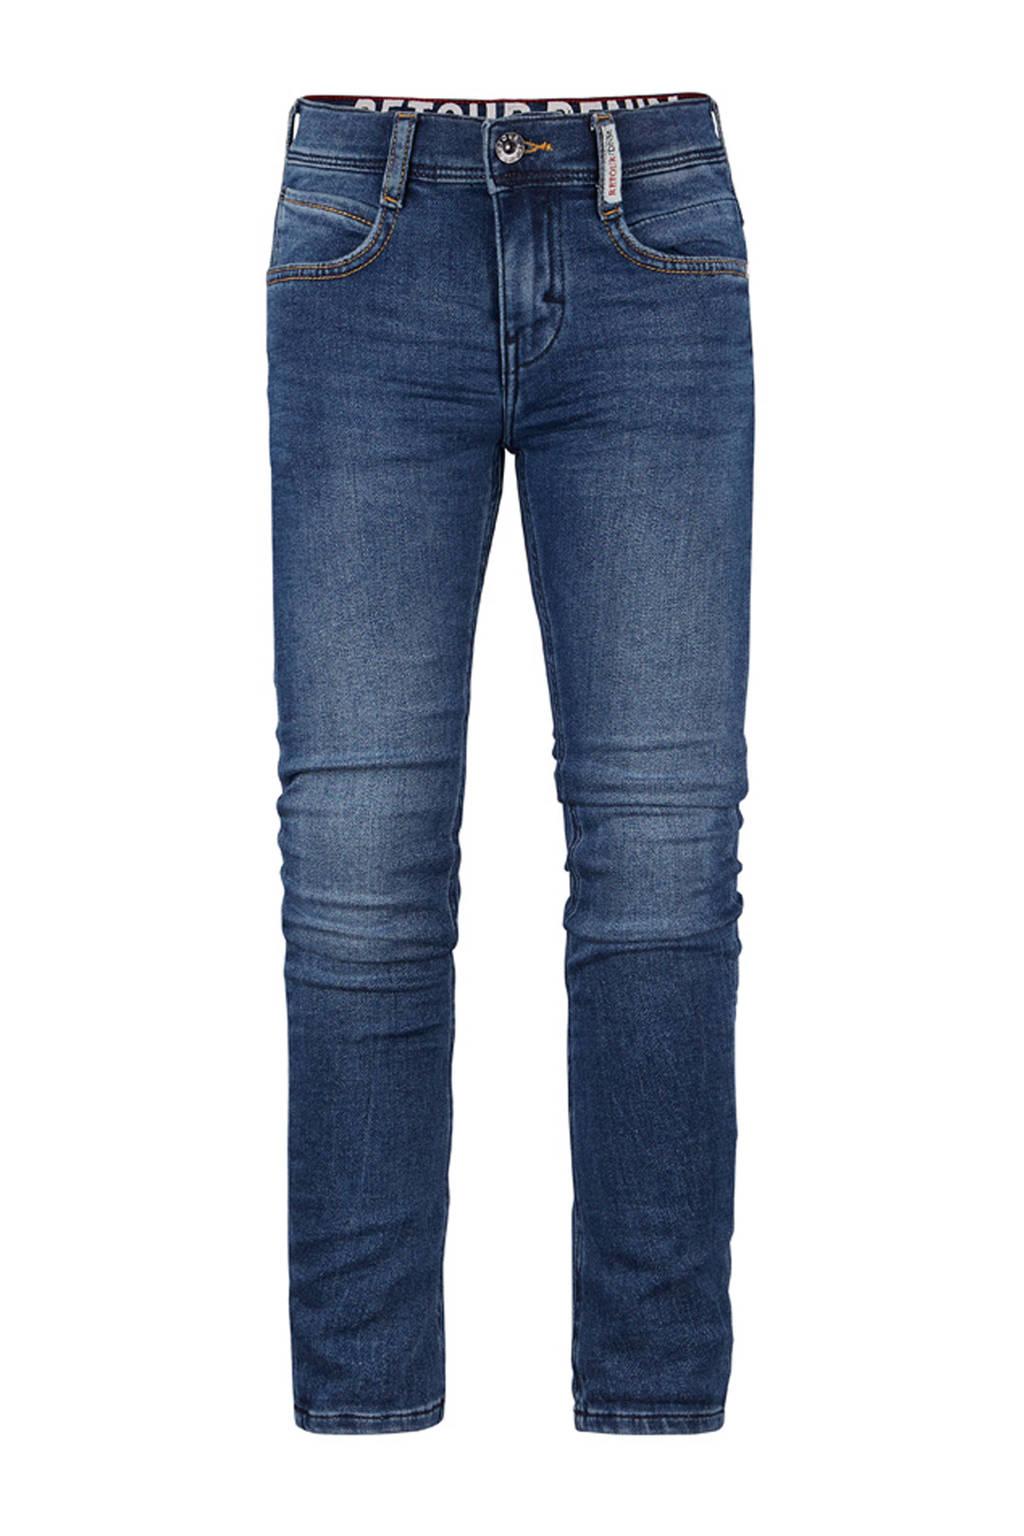 Retour Denim regular fit jeans Luigi dark denim, Dark denim stonewashed